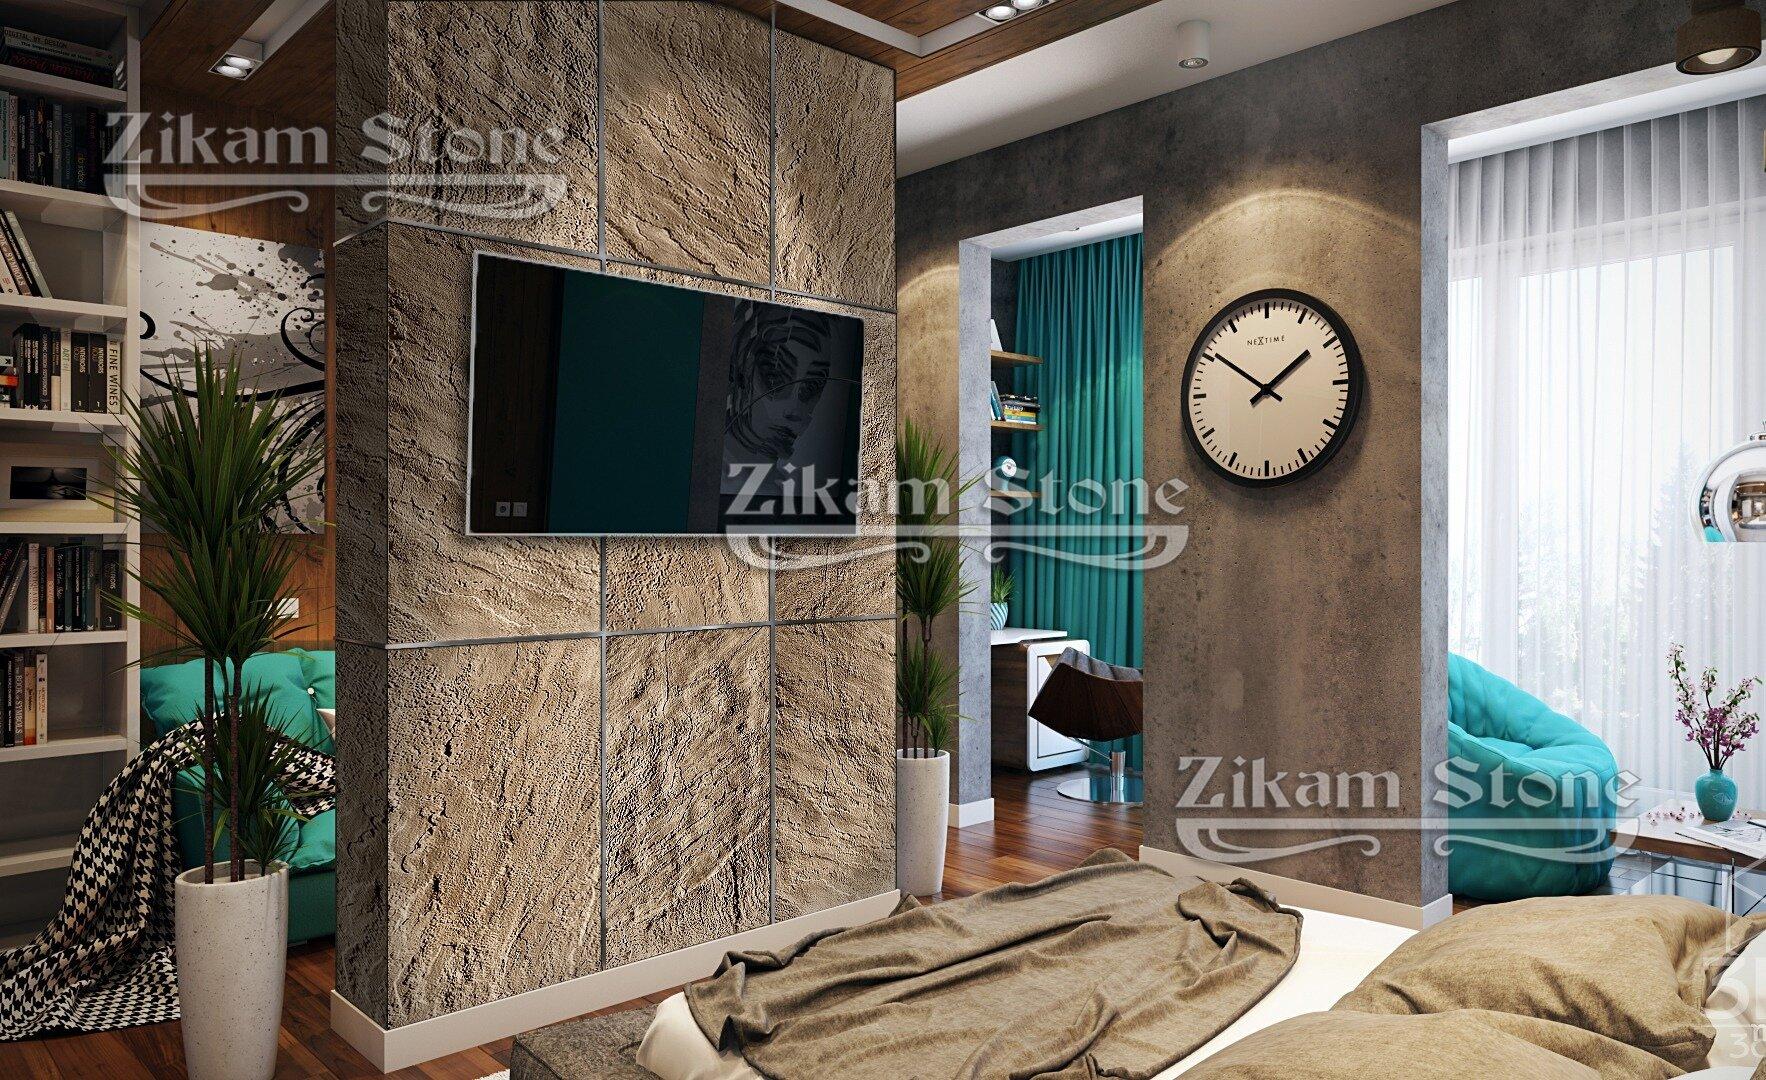 Гибкий каменный шпон ZIKAM Stone. Лист 1000х500 мм. Толщина 2-3 мм. Фасадно-интерьерный.